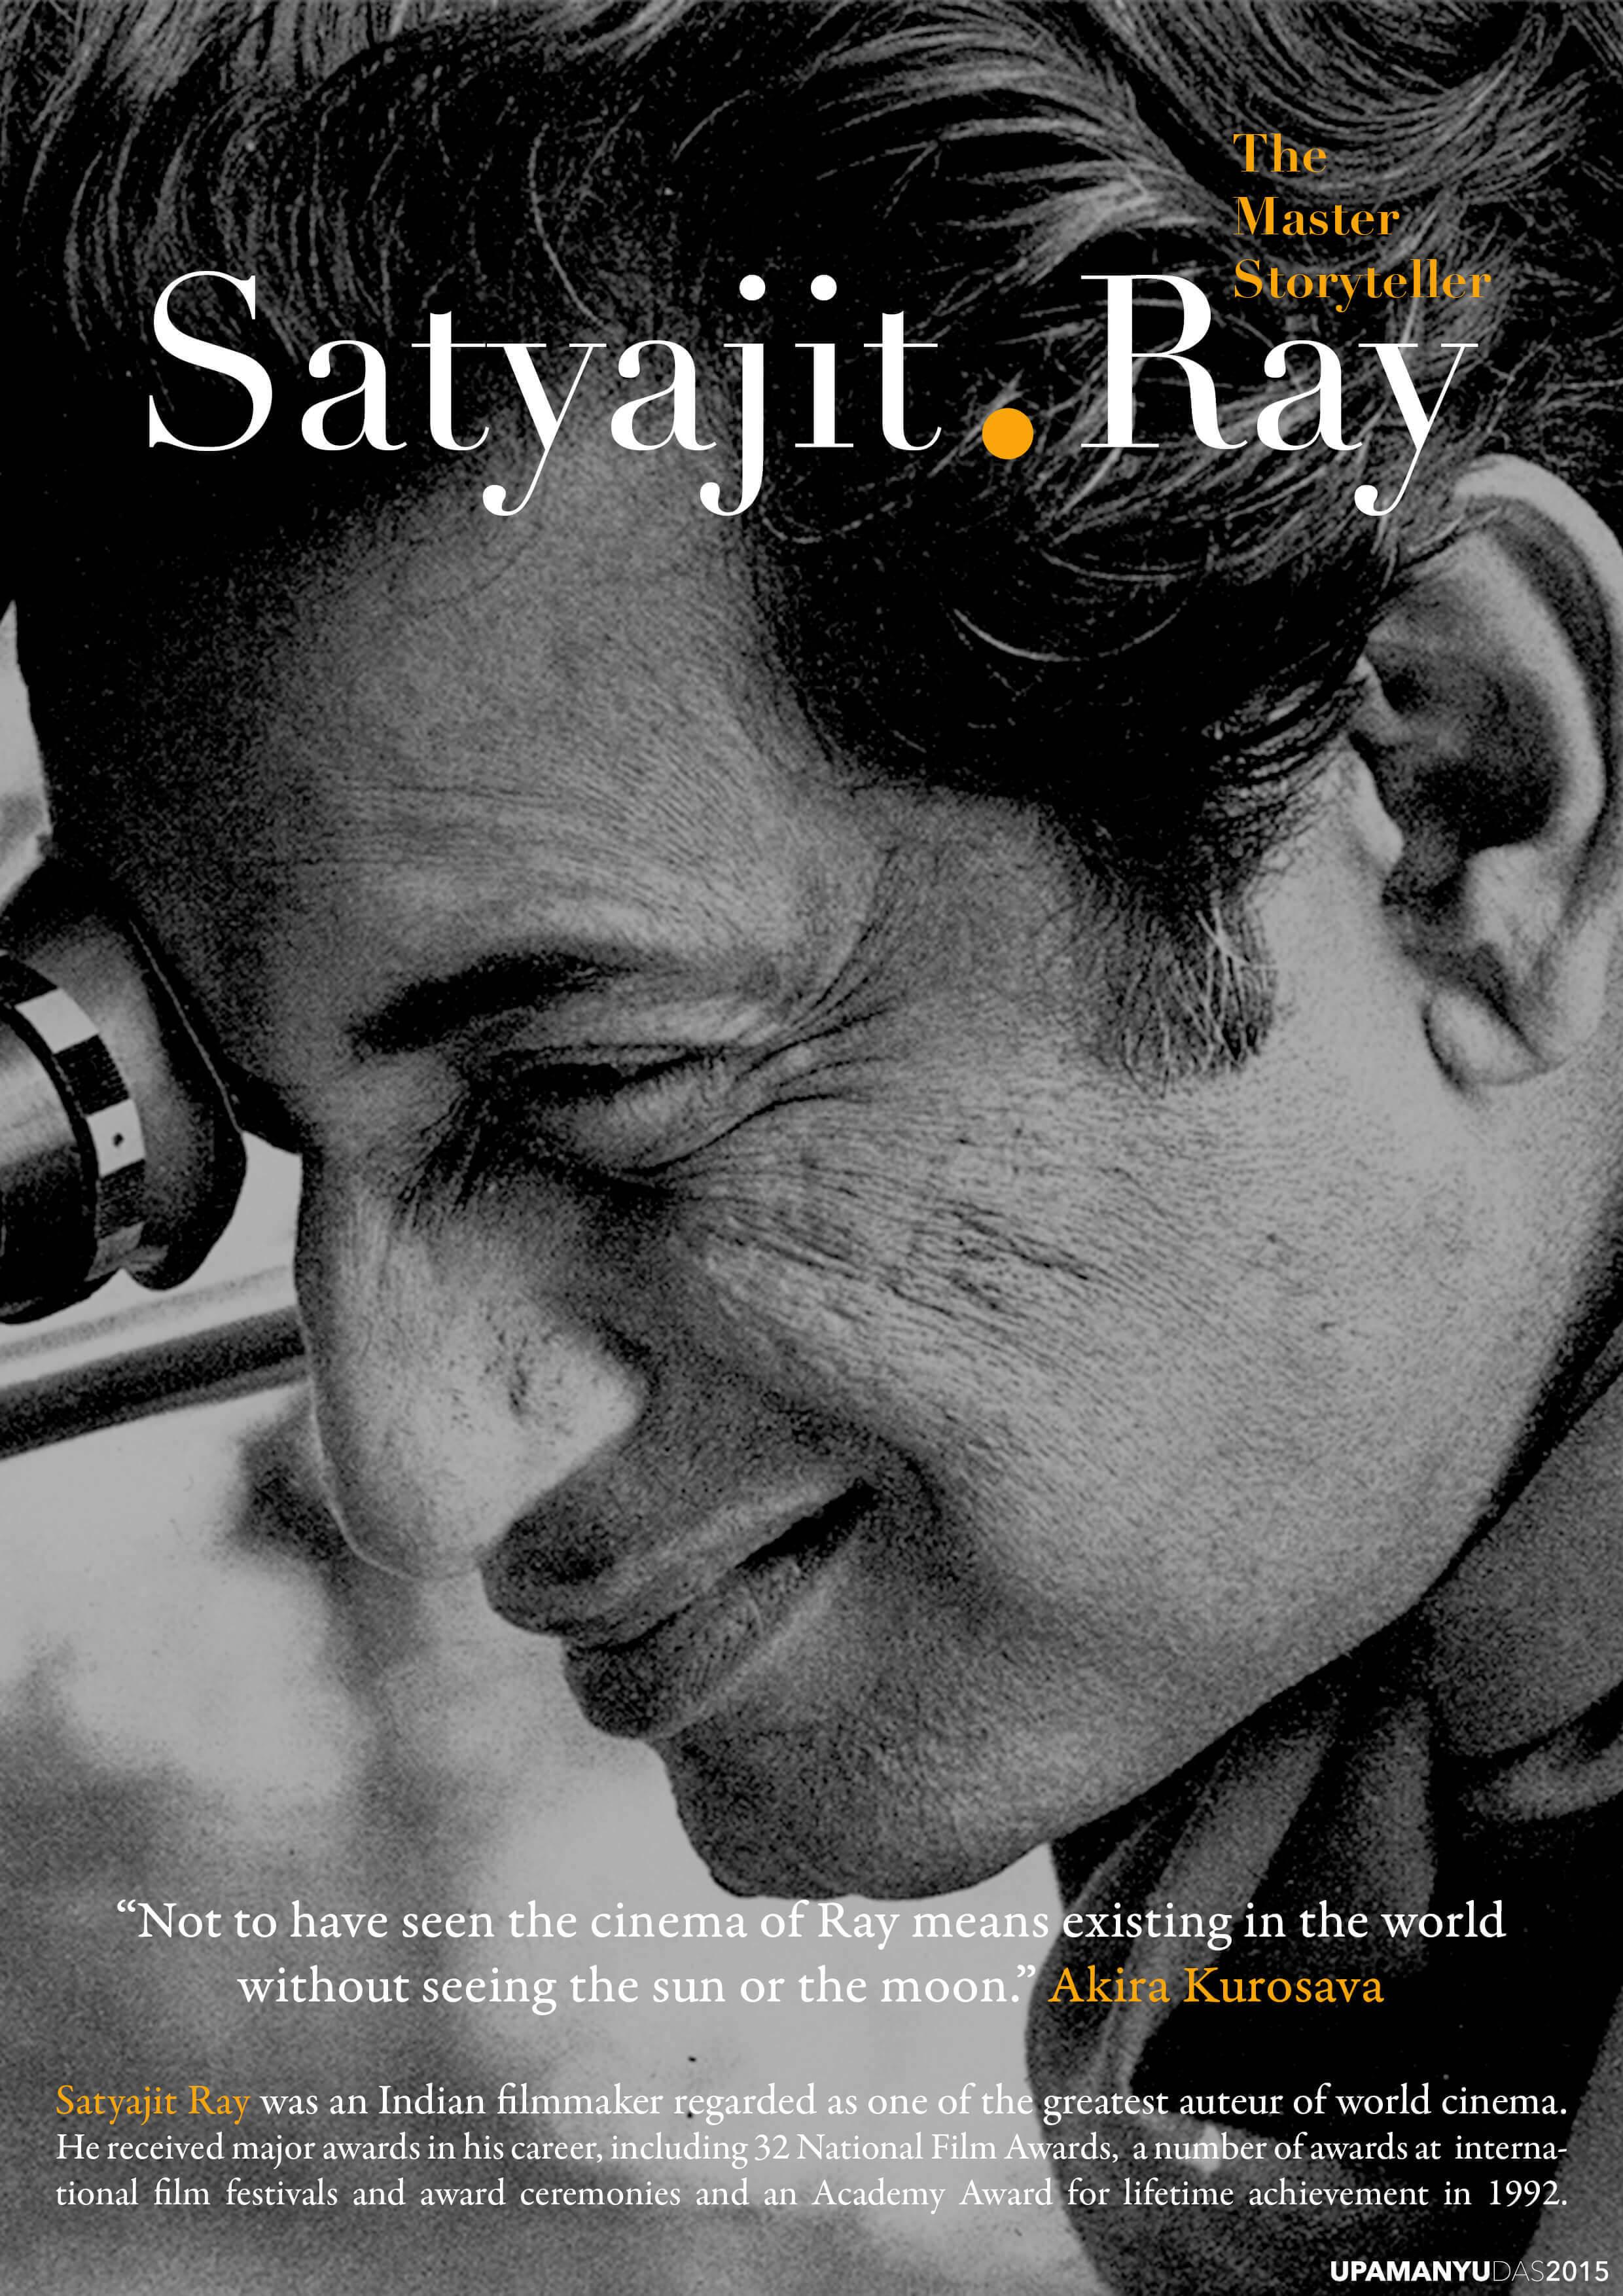 satyajit ray works